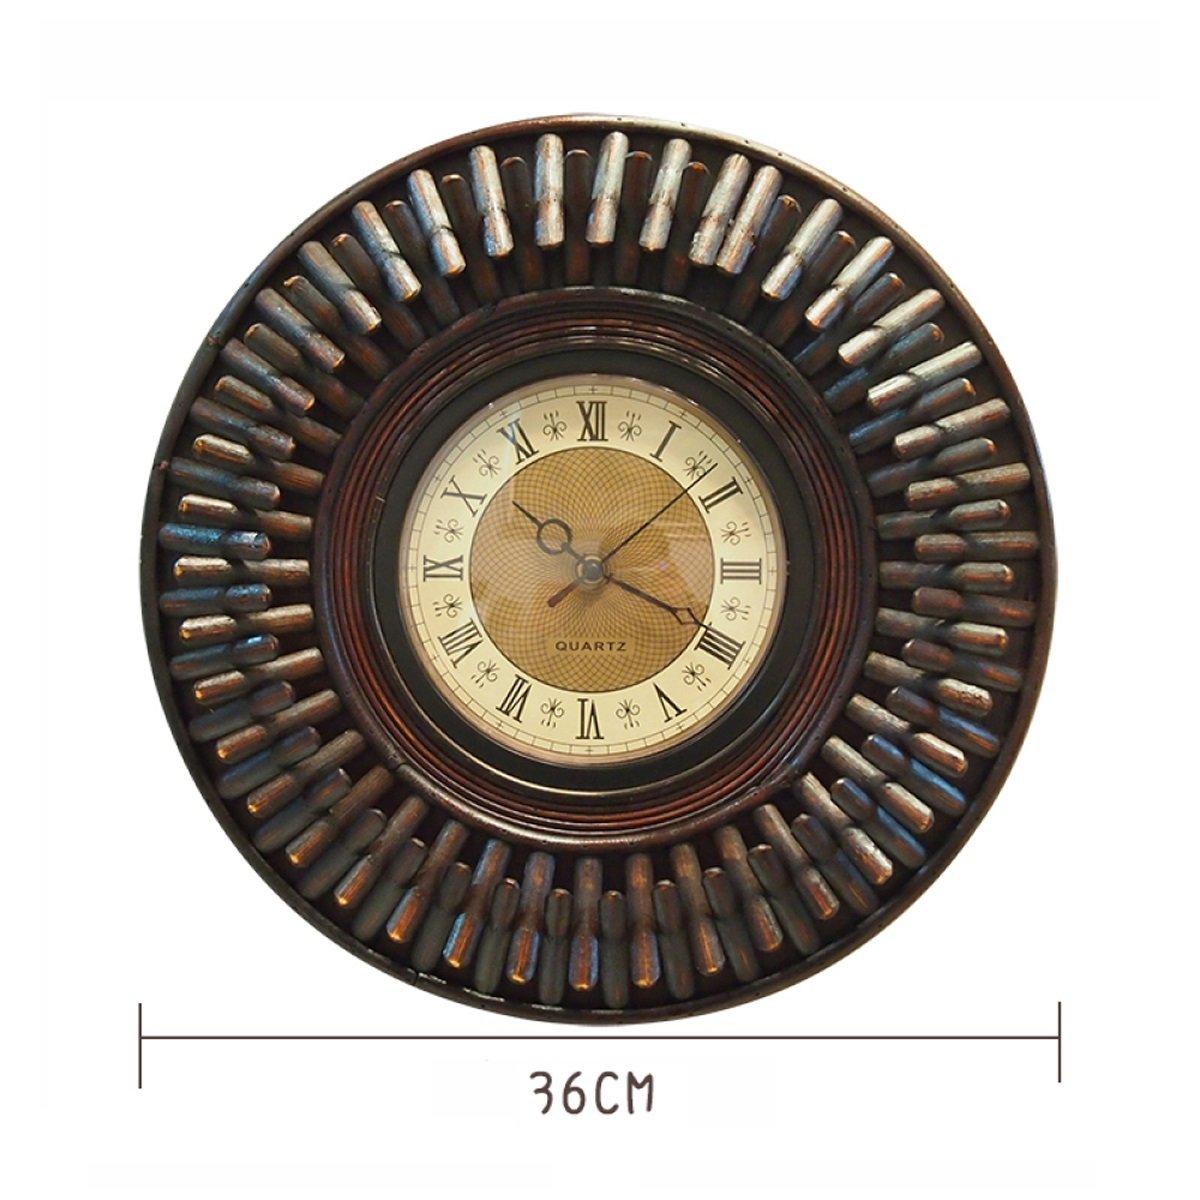 WAZY ウォールクロックアメリカンスタイルのレトロな家庭の竹時計と時計ヨーロッパのレストランアートの装飾的な壁のチャート(茶色の36 * 36センチメートル1パッキング) (色 : B) B07DW6661N B B